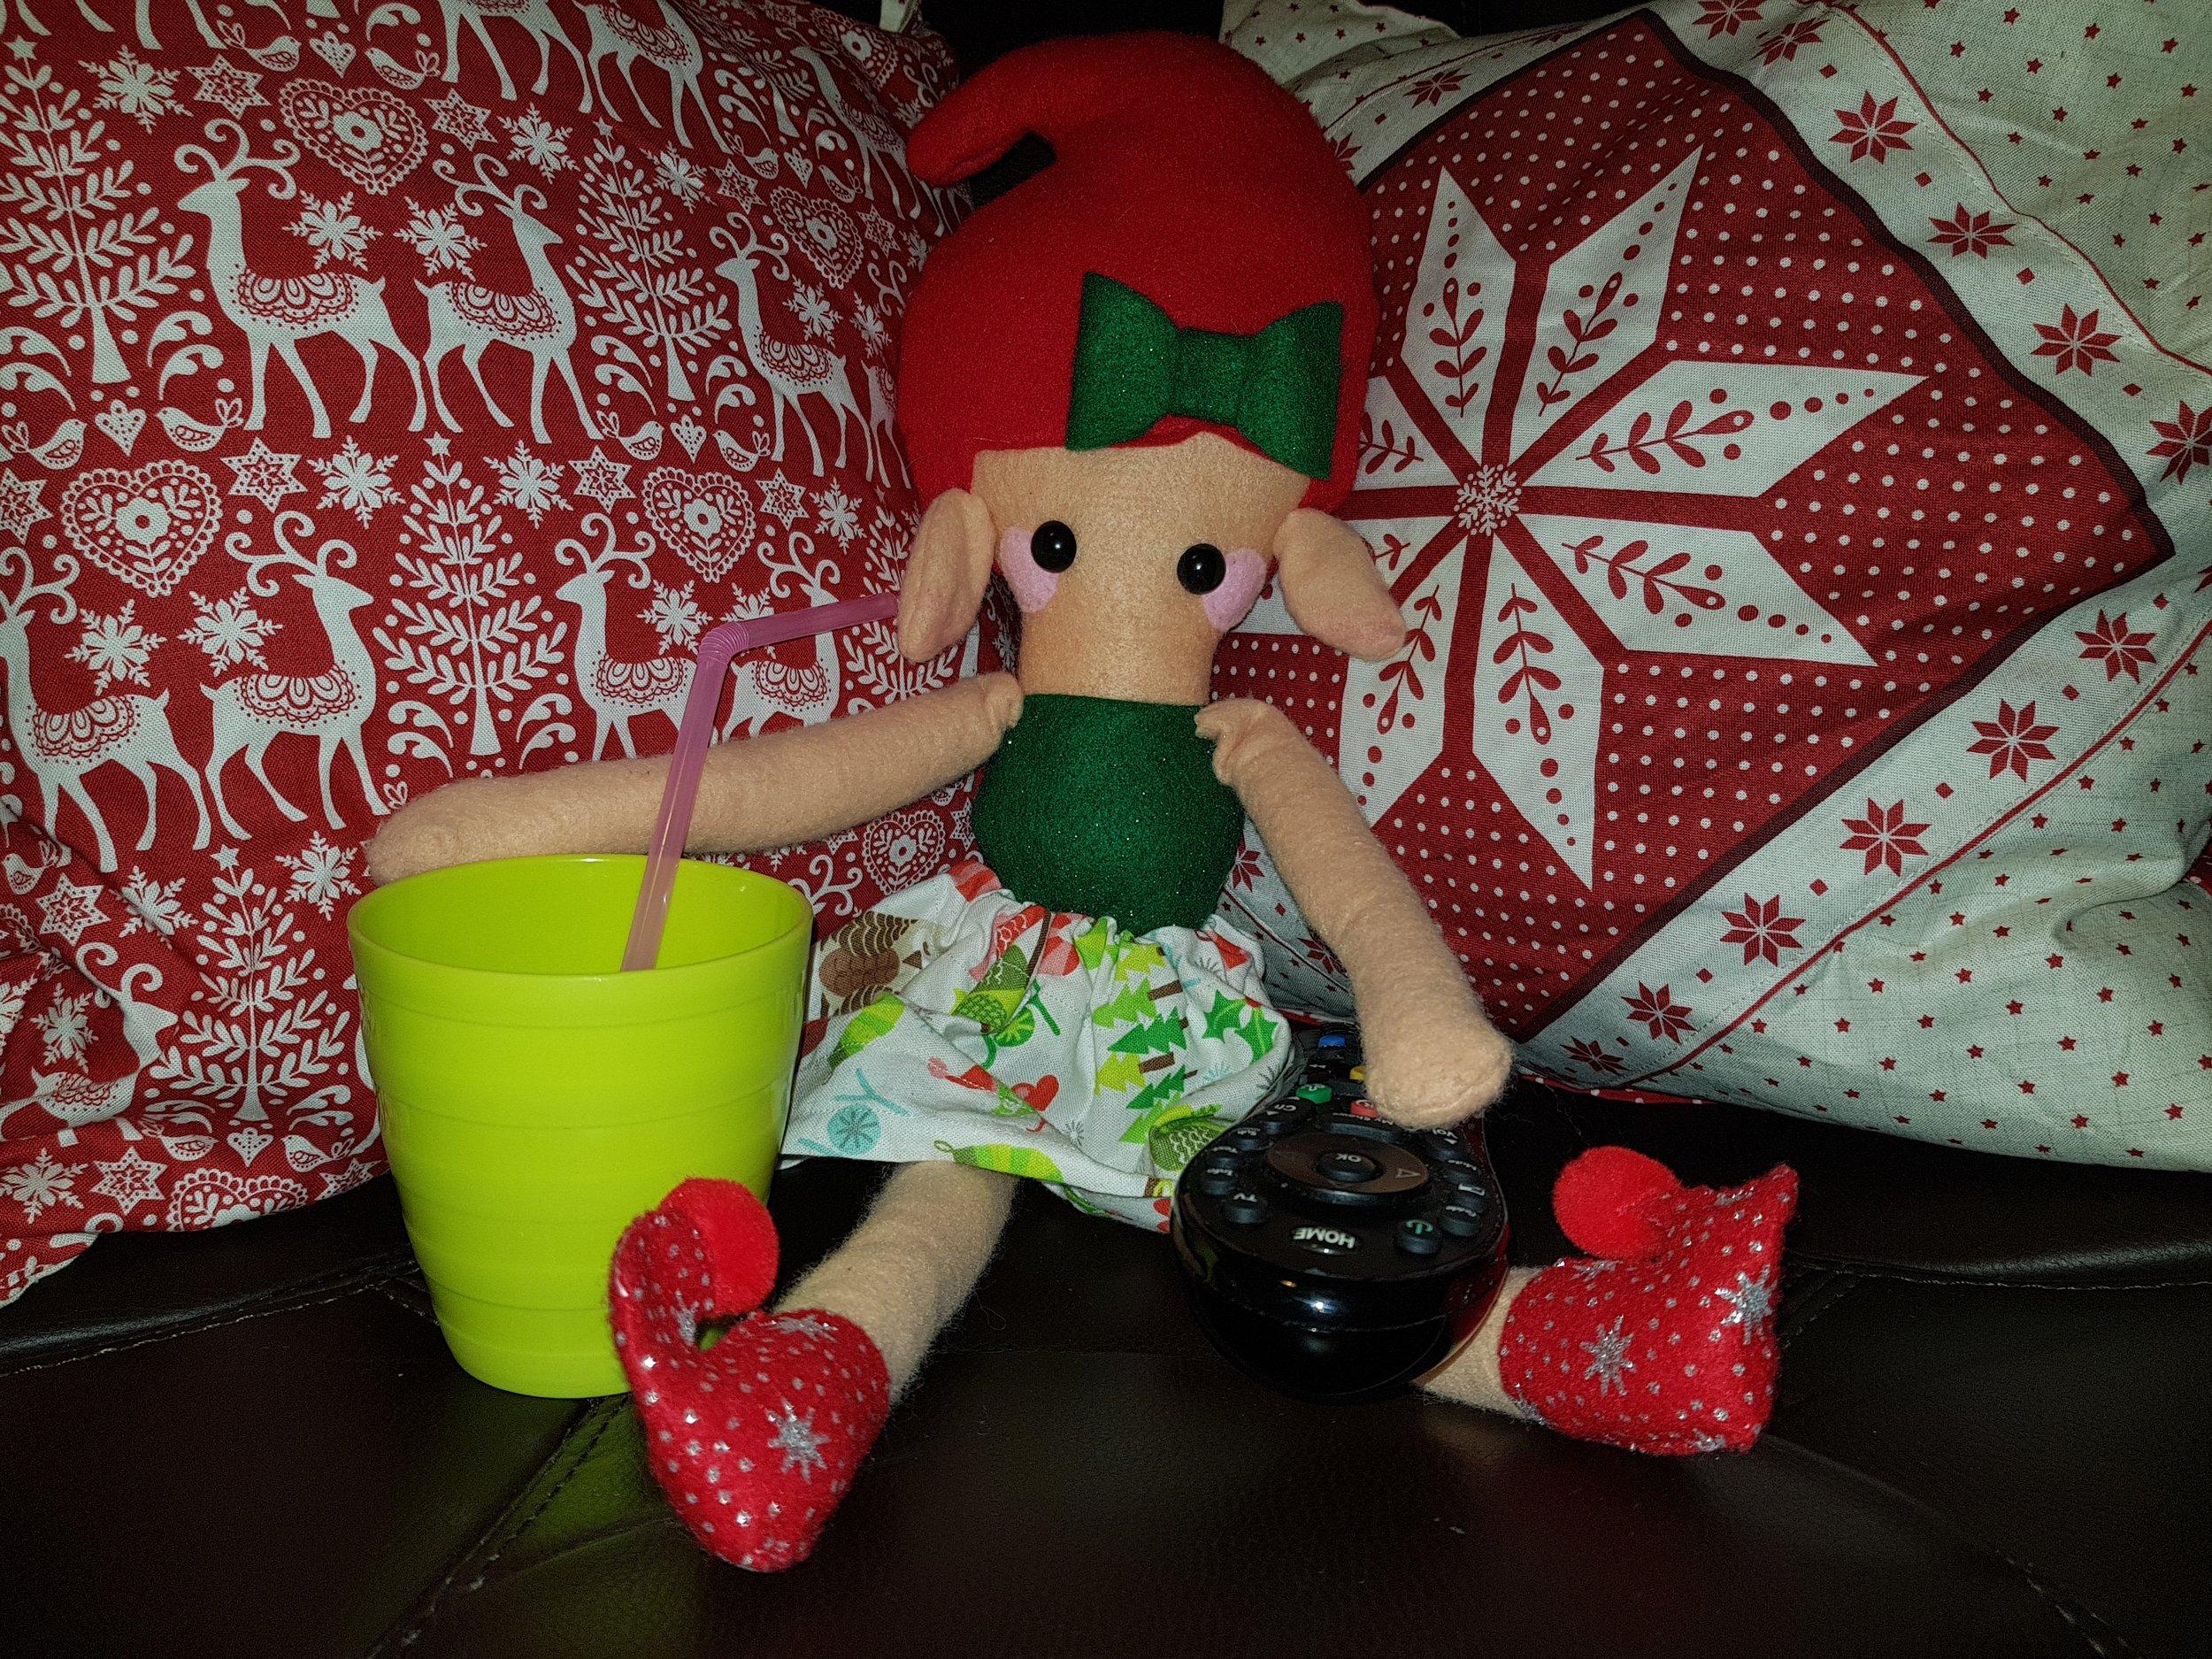 Elf on a Shelf December 5th Watching TV